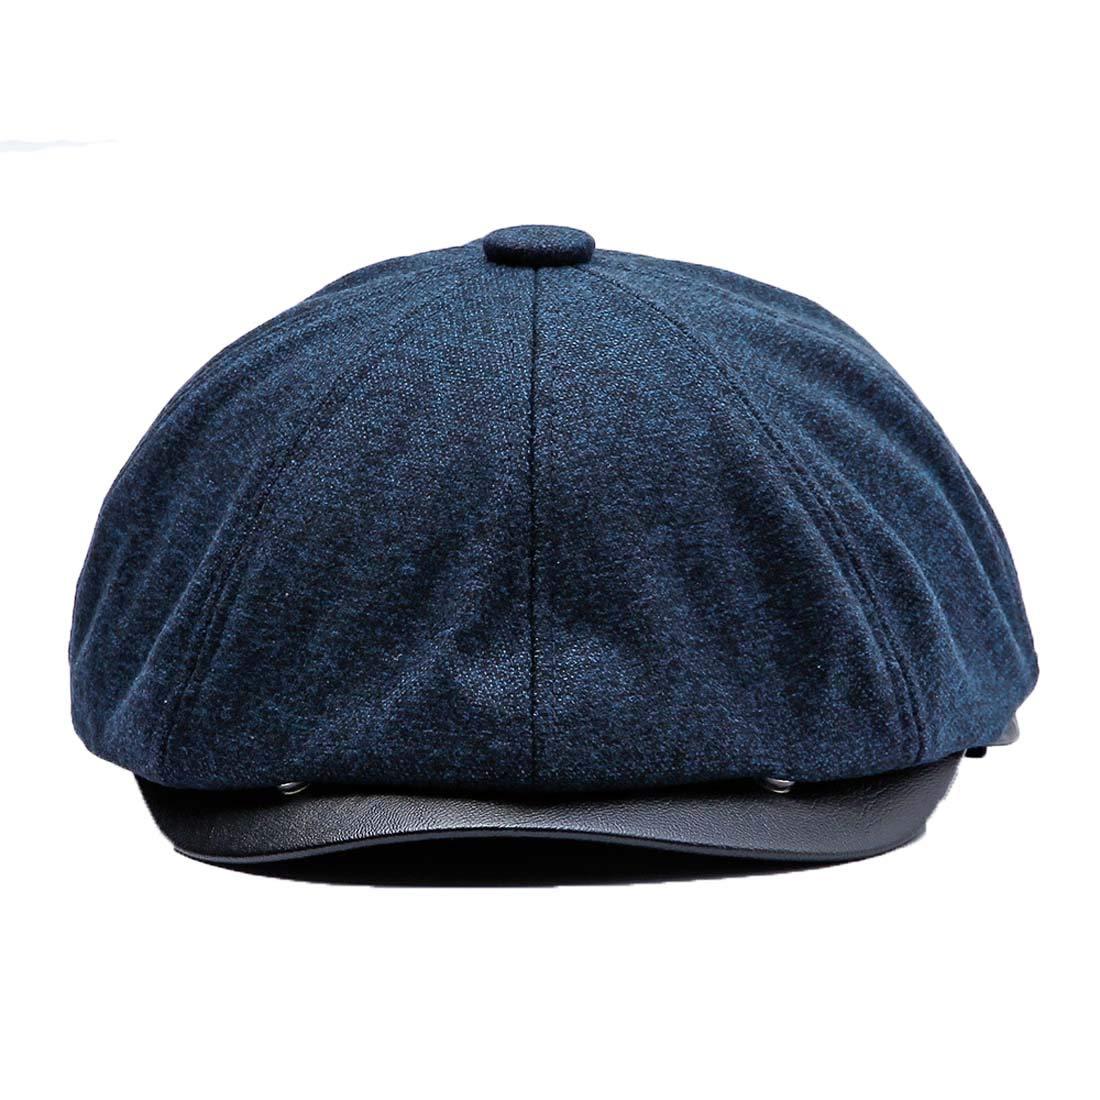 Topcoco Mens 8 Panel Wool Blend Warm Newsboy Snap Brim Collection Flat Cap